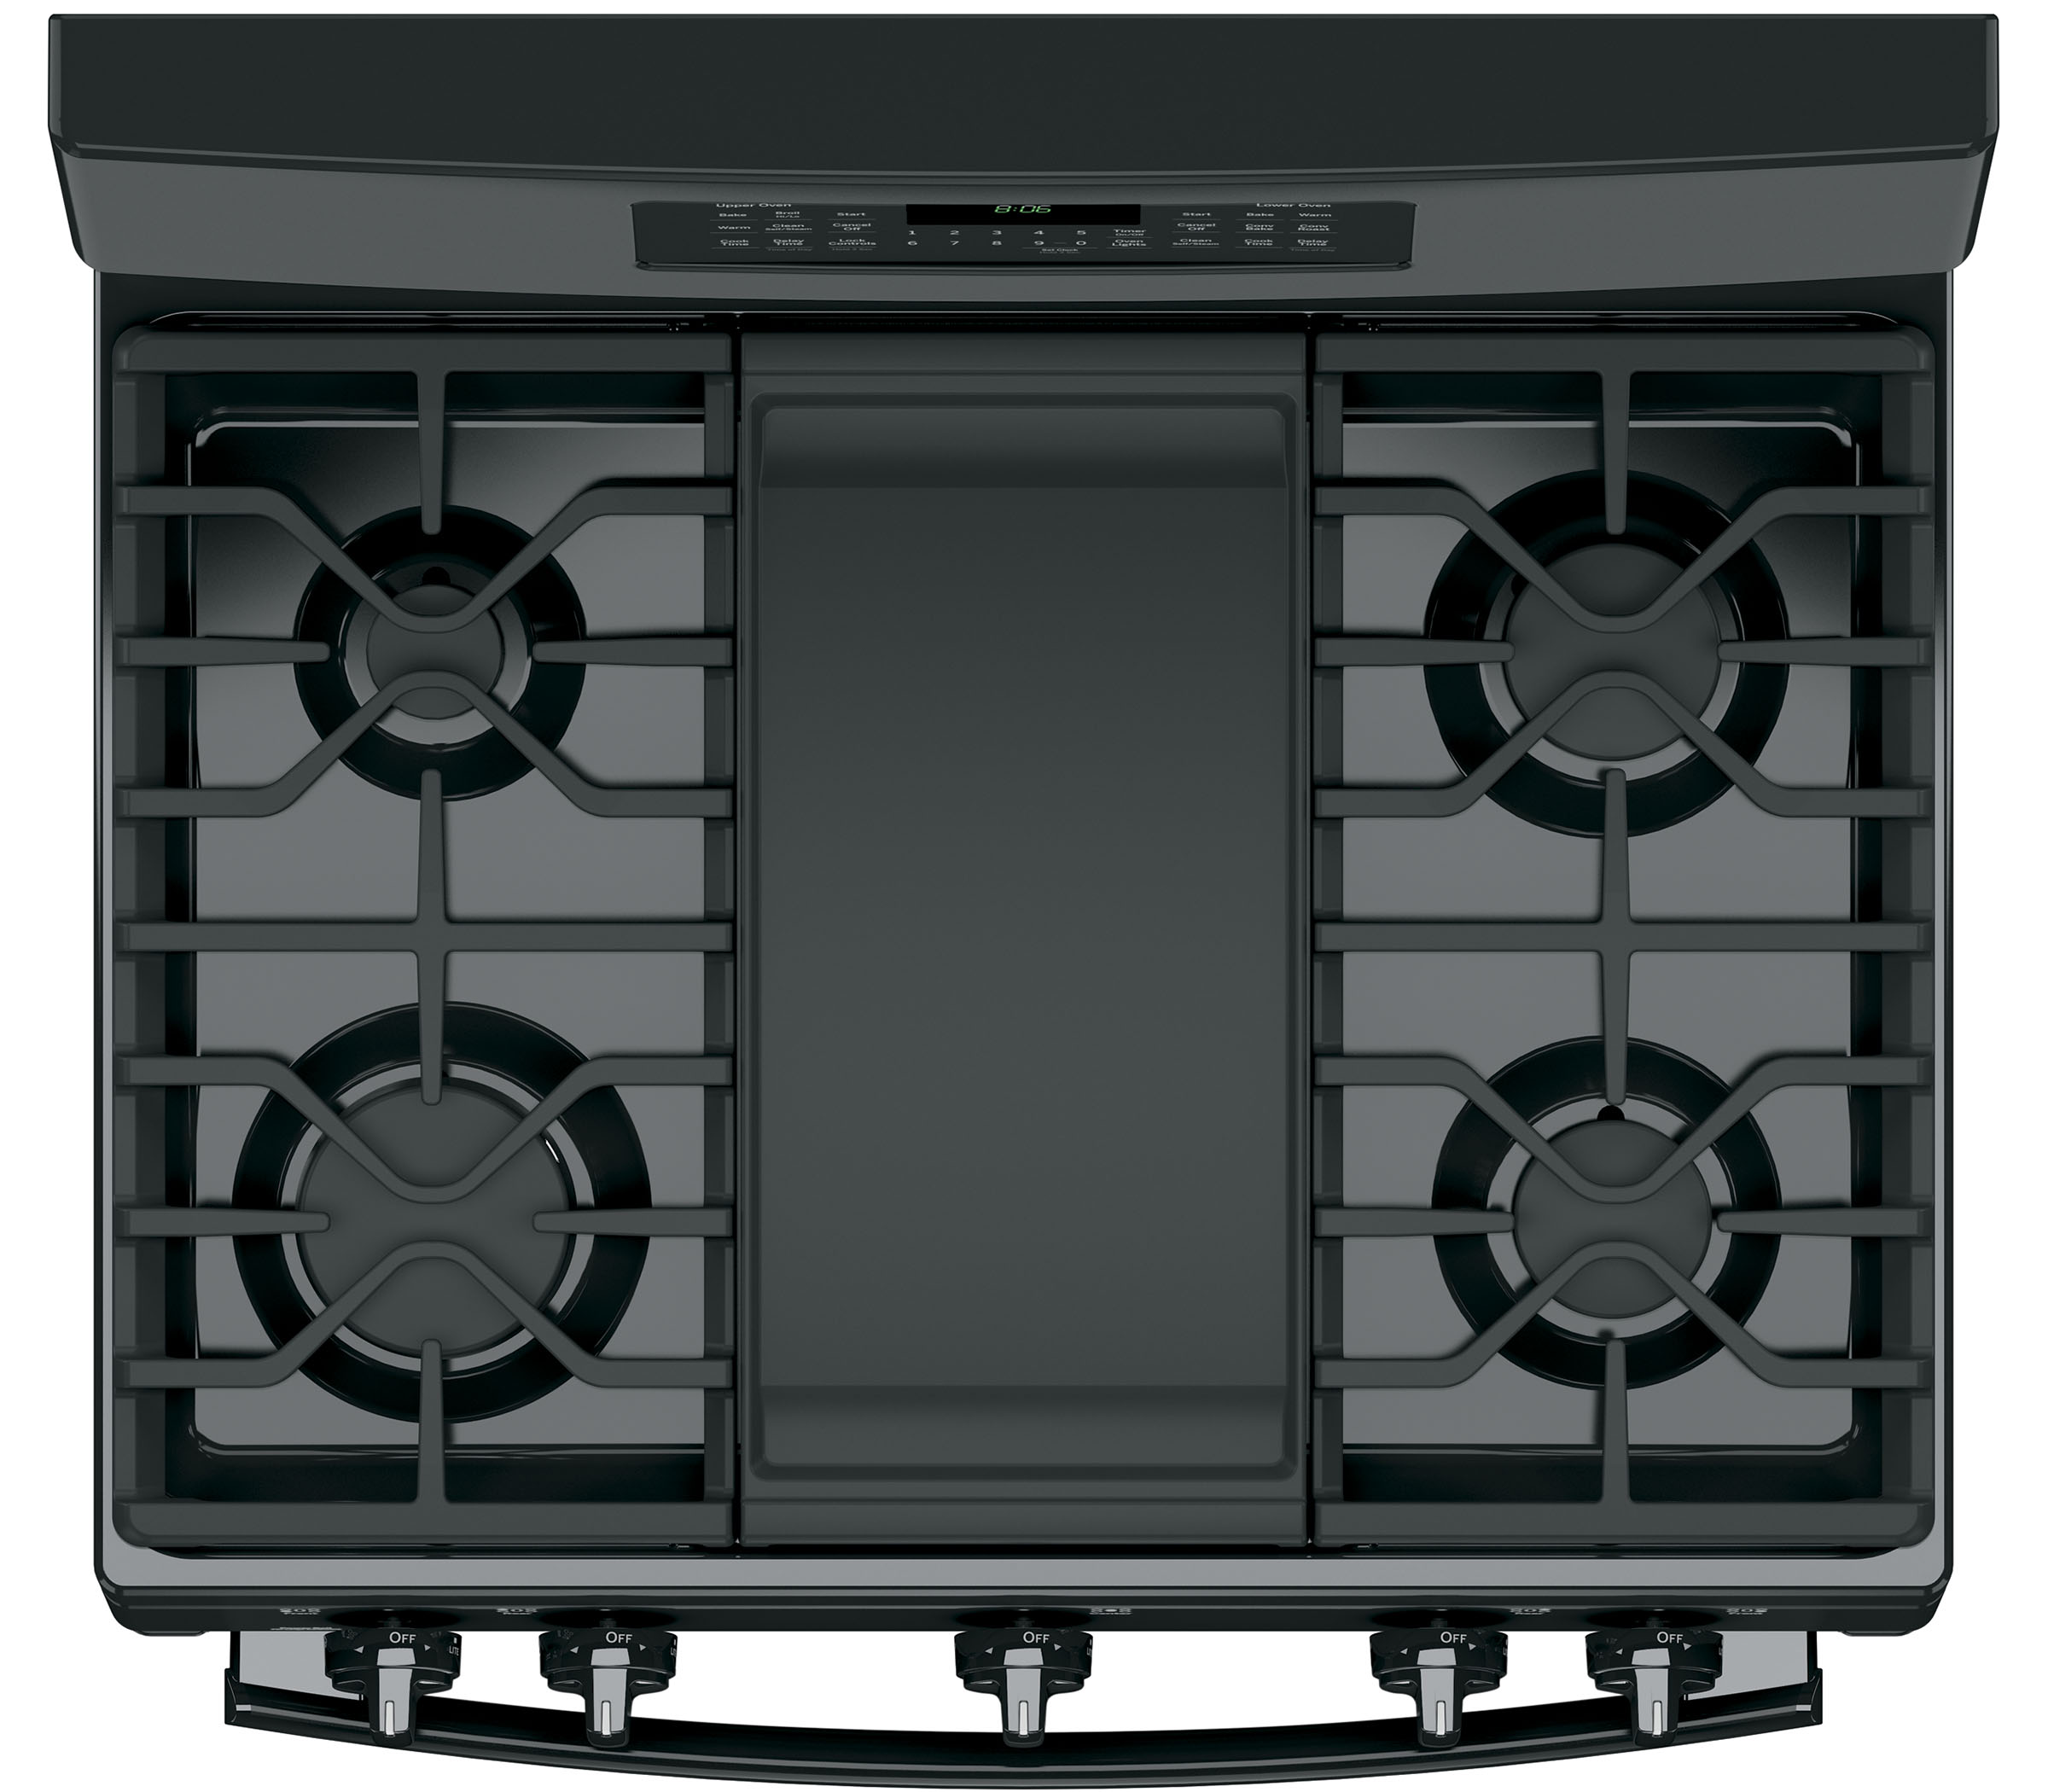 GE Appliances JGB860DEJBB 6.8 cu. ft. Freestanding Gas Double Oven Convection Range - Stainless Steel - Black